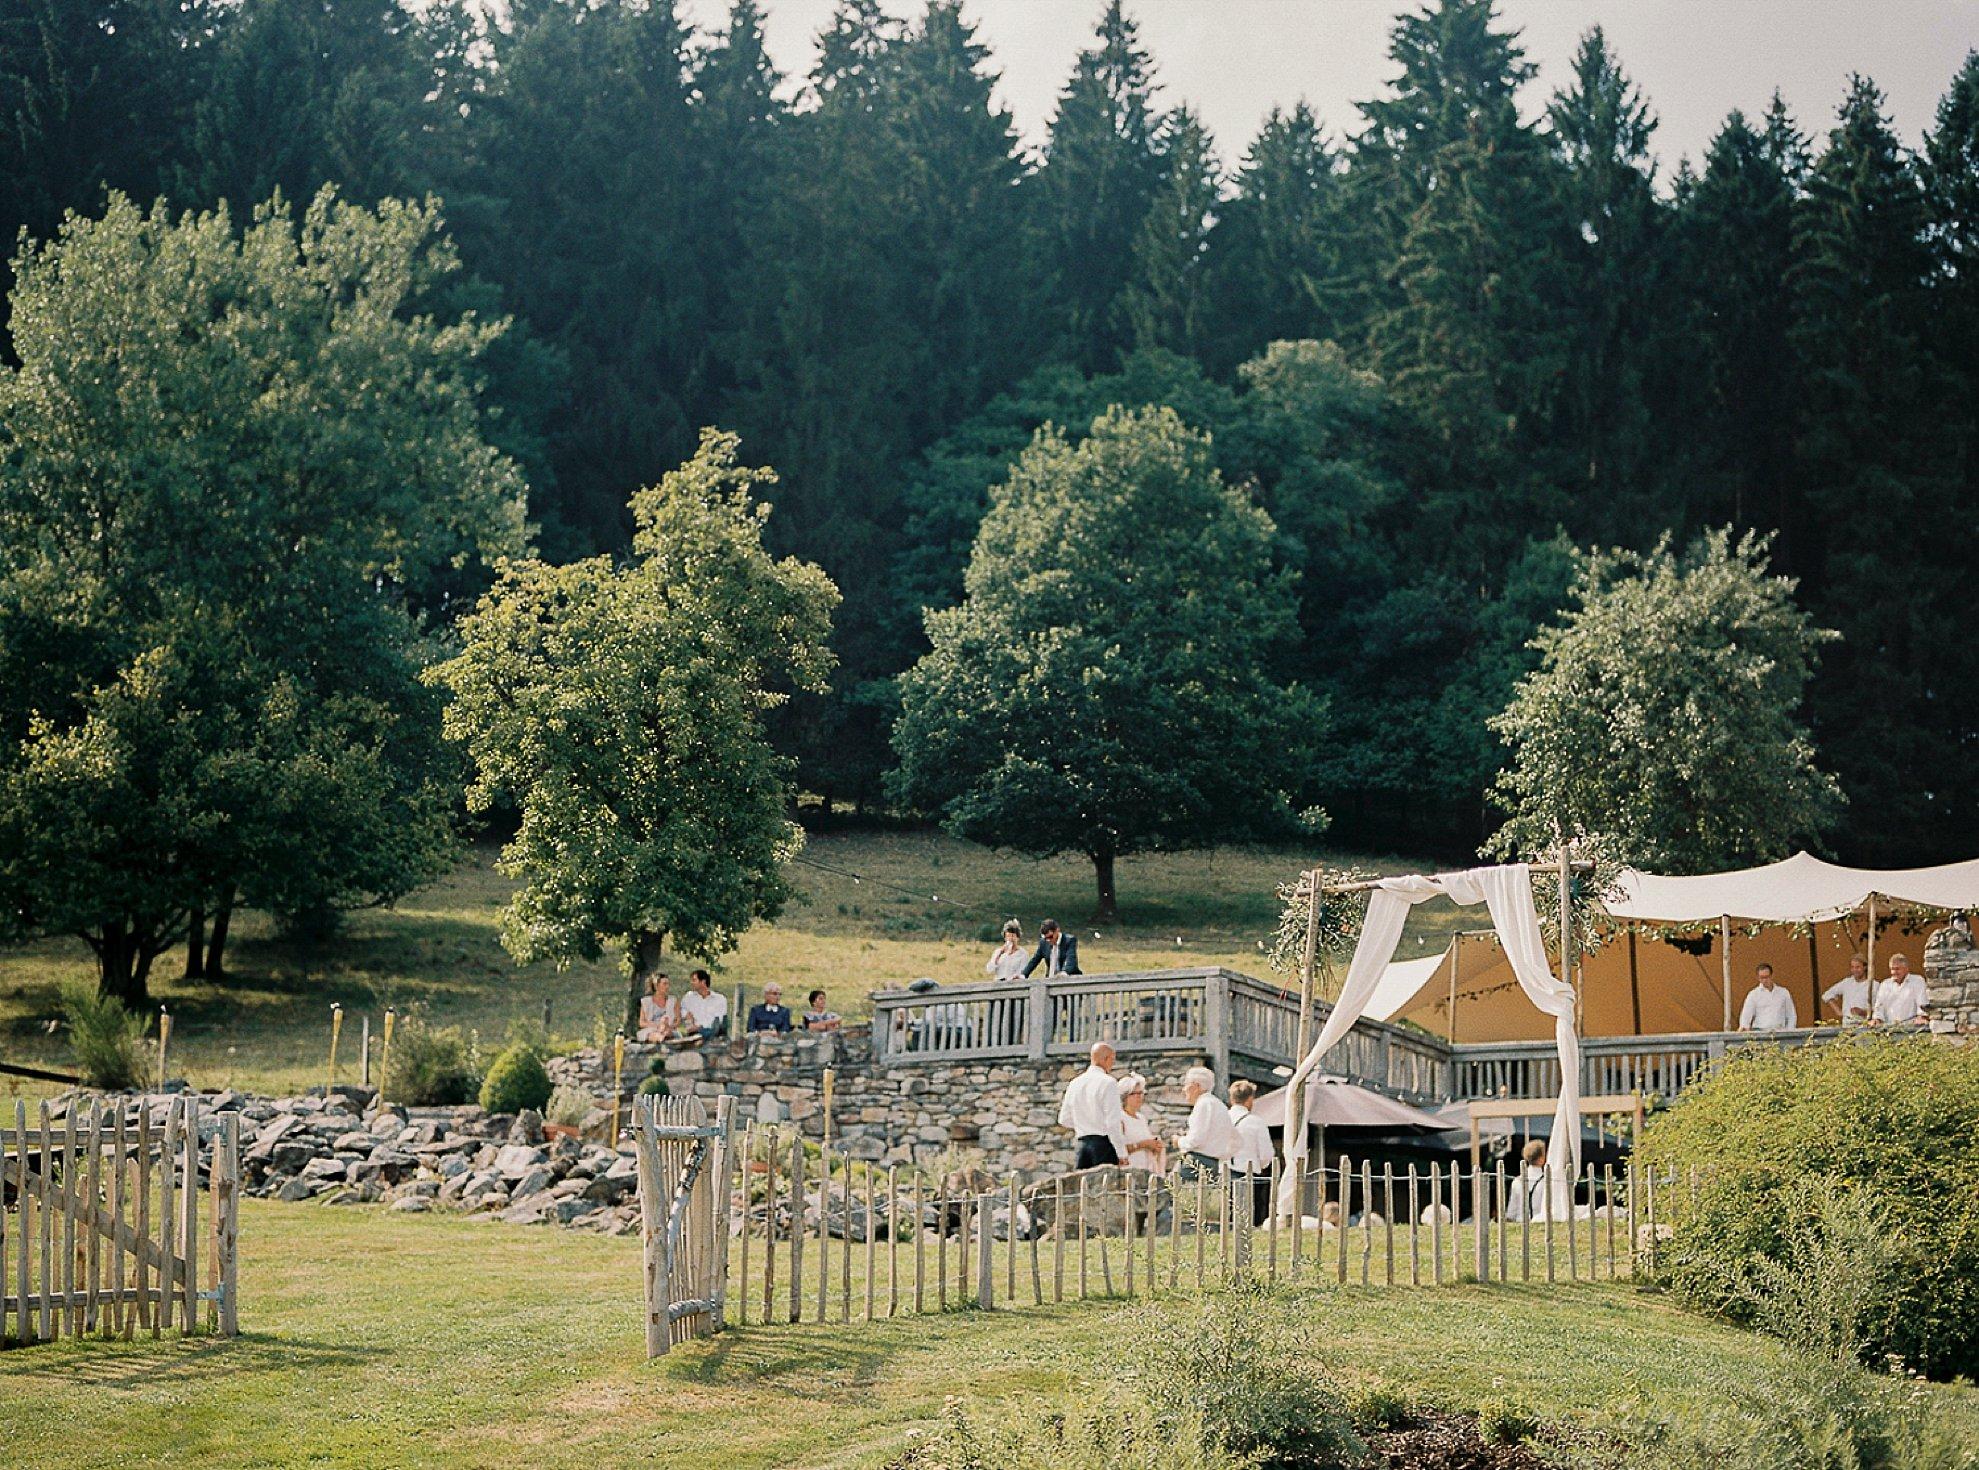 Amanda-Drost-Fotografie-Belgie-Photography-Wedding_0019.jpg